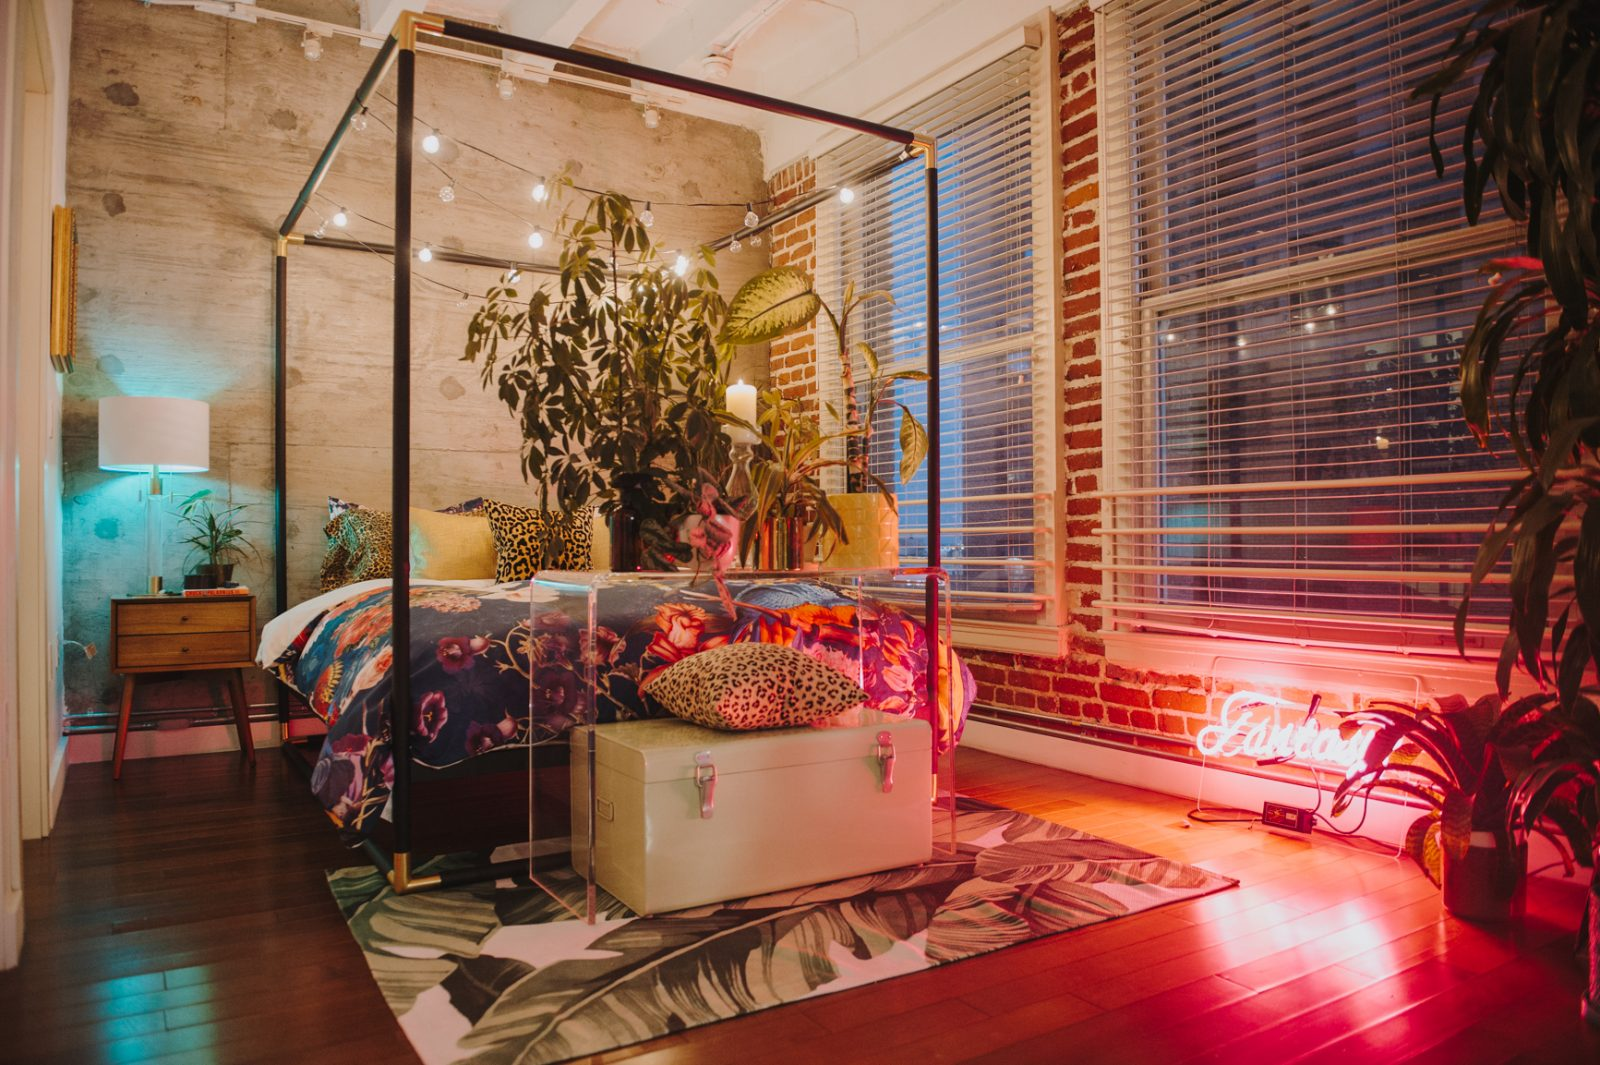 6 Ways To Turn A Loft Into An Urban Jungle Paradise - Society6 Blog